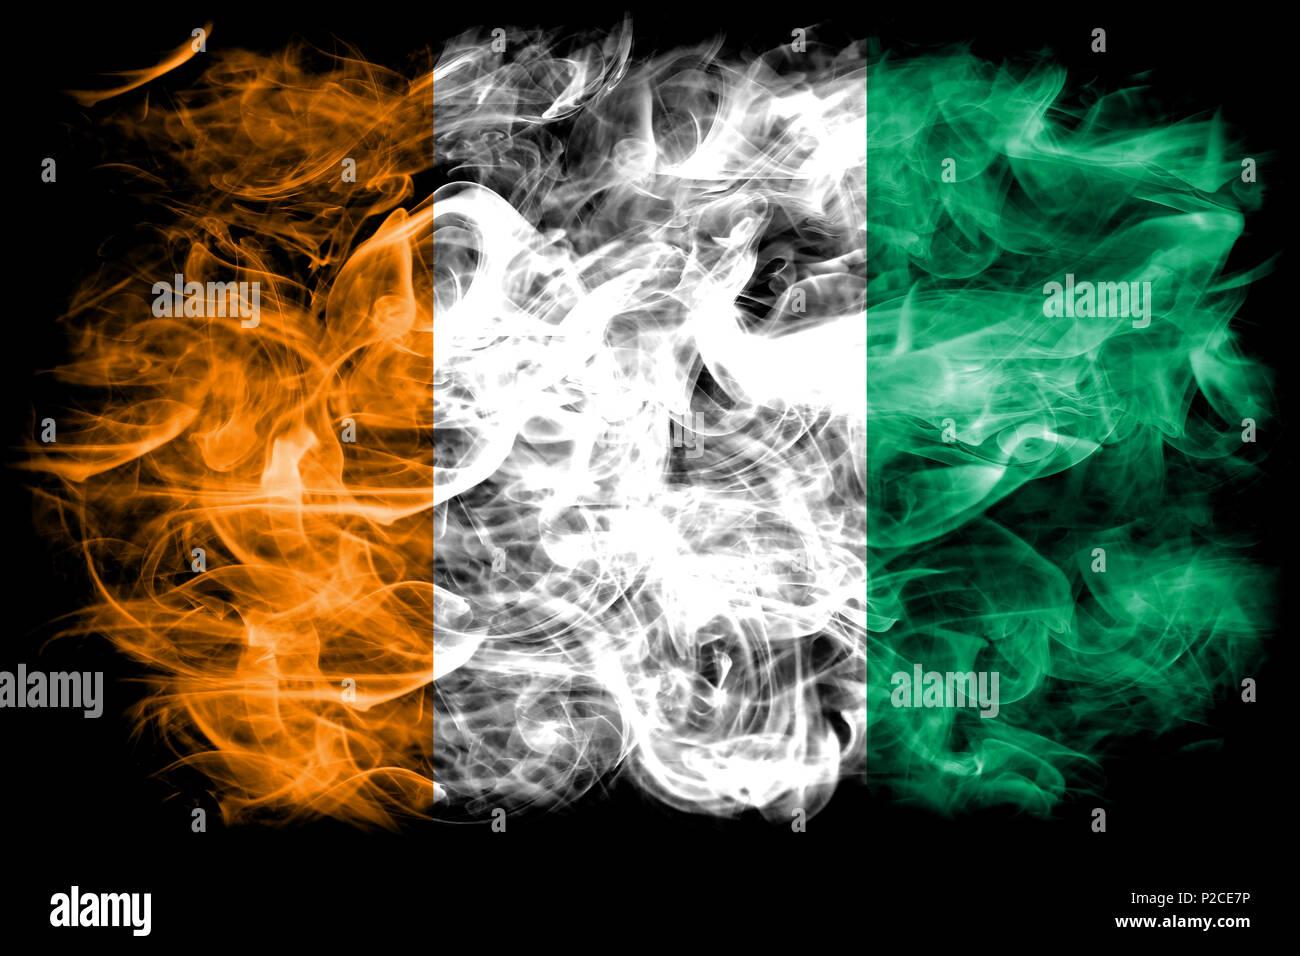 Cote d'Ivoire smoke flag - Stock Image